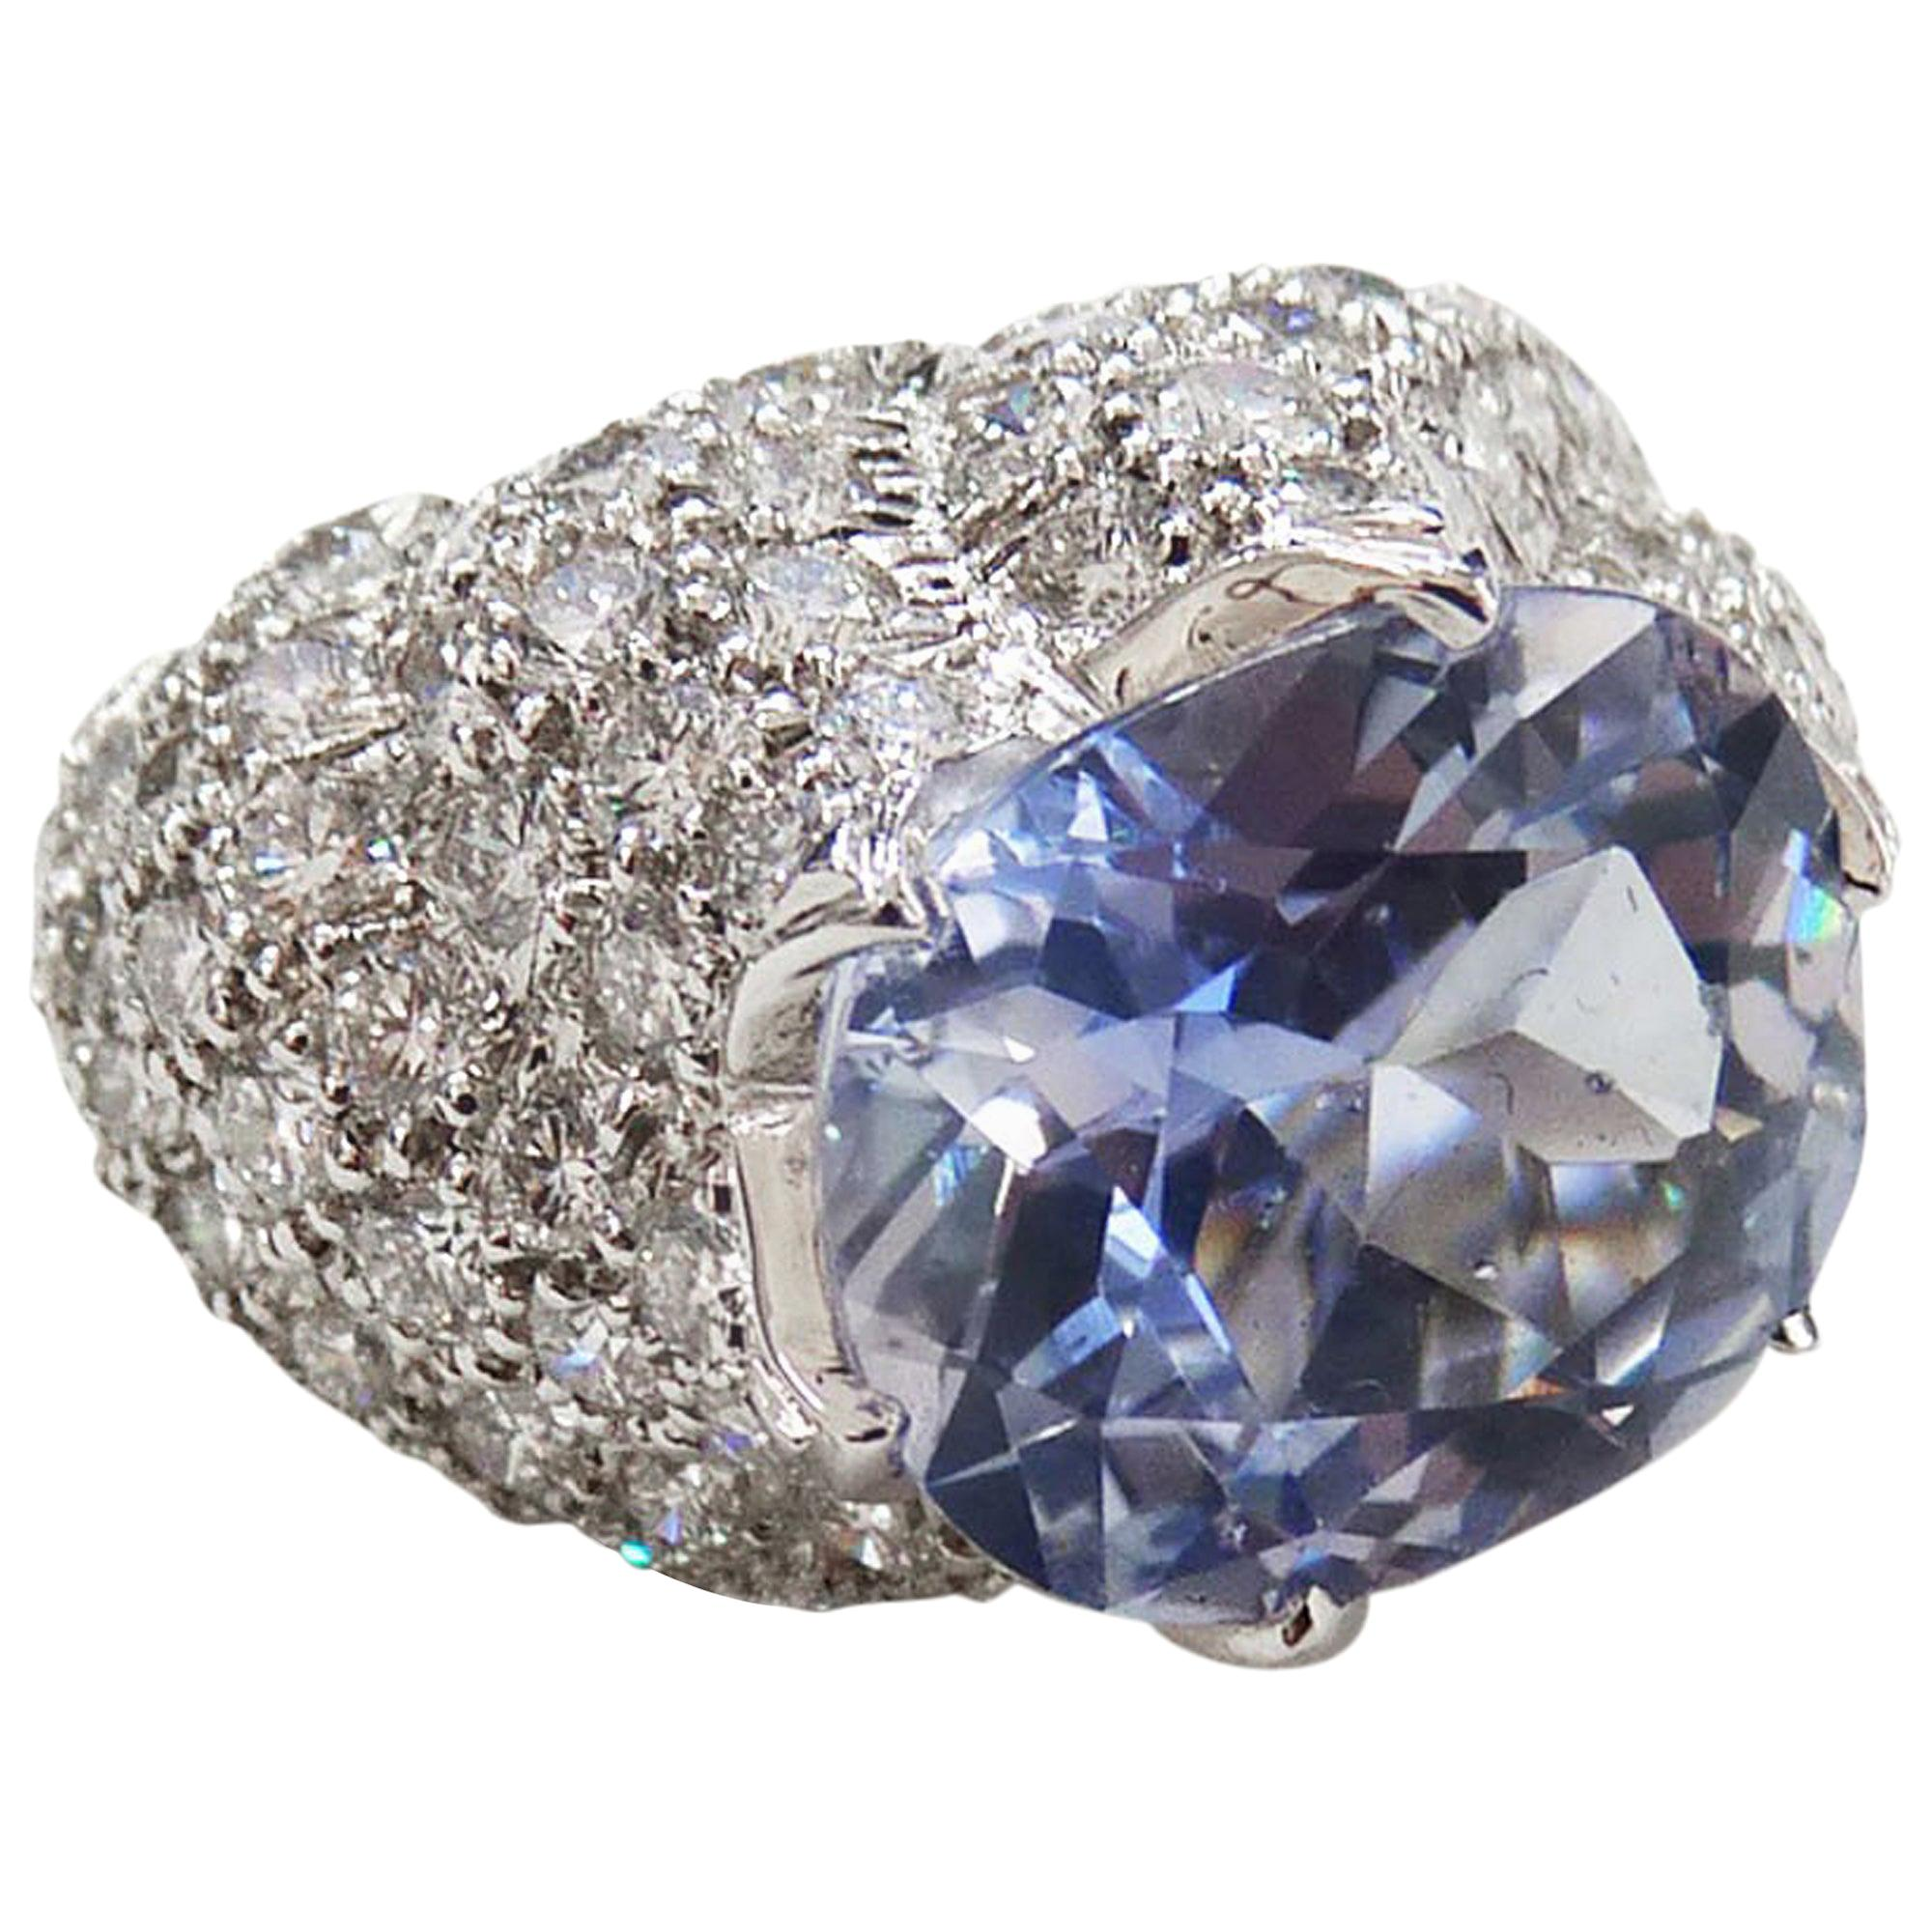 David Webb Certified Sapphire Diamond Cocktail Ring